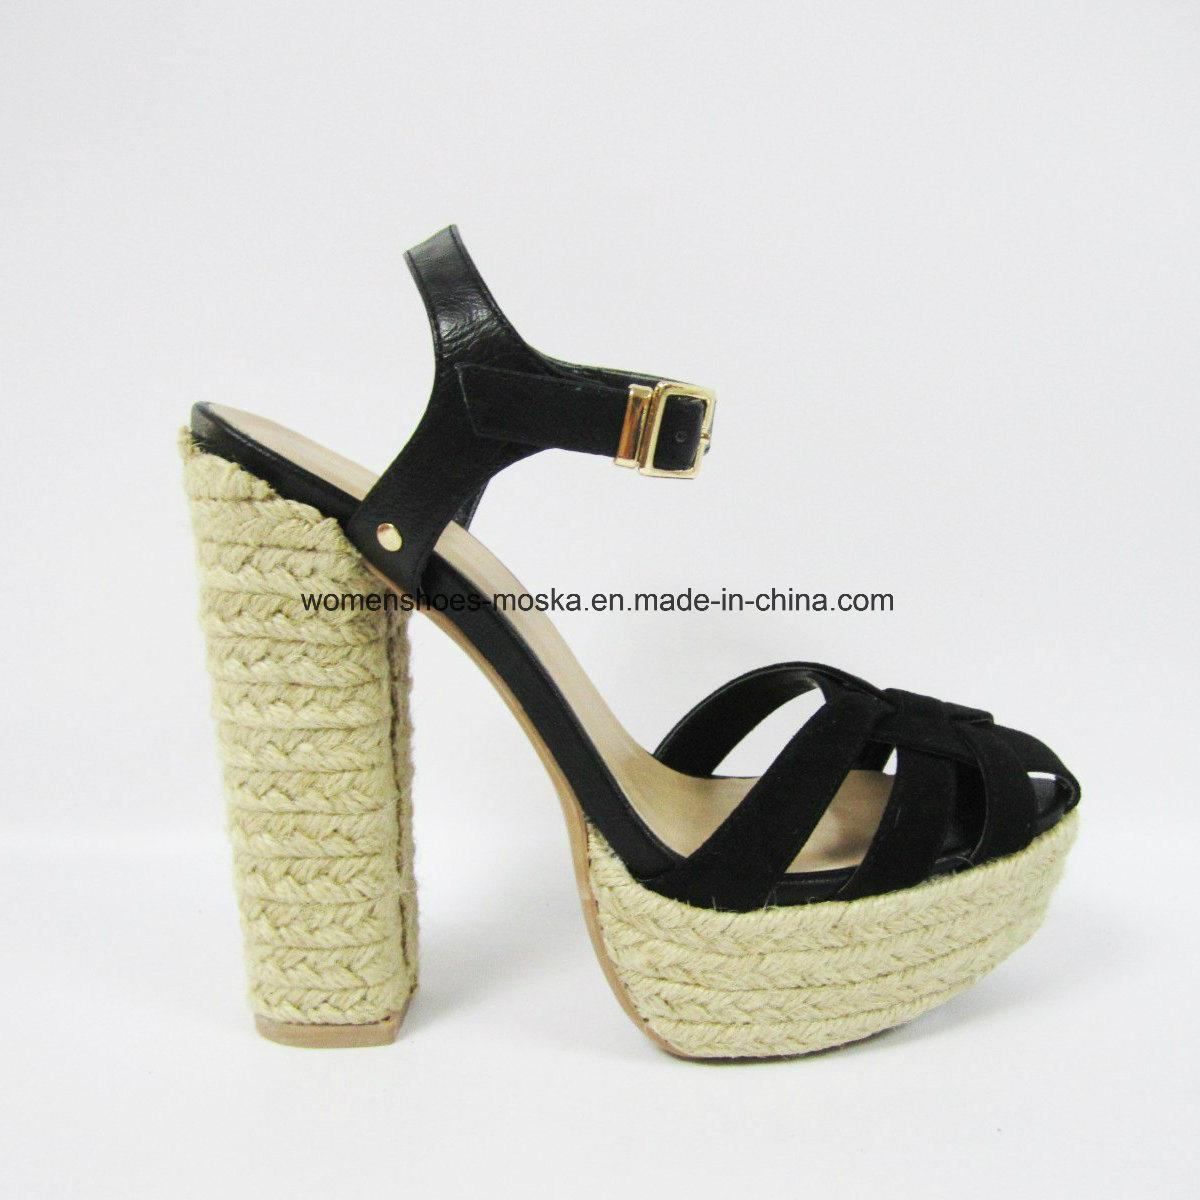 Hot Sale Women Fashion Chunky High Heel Sandal with High Quality